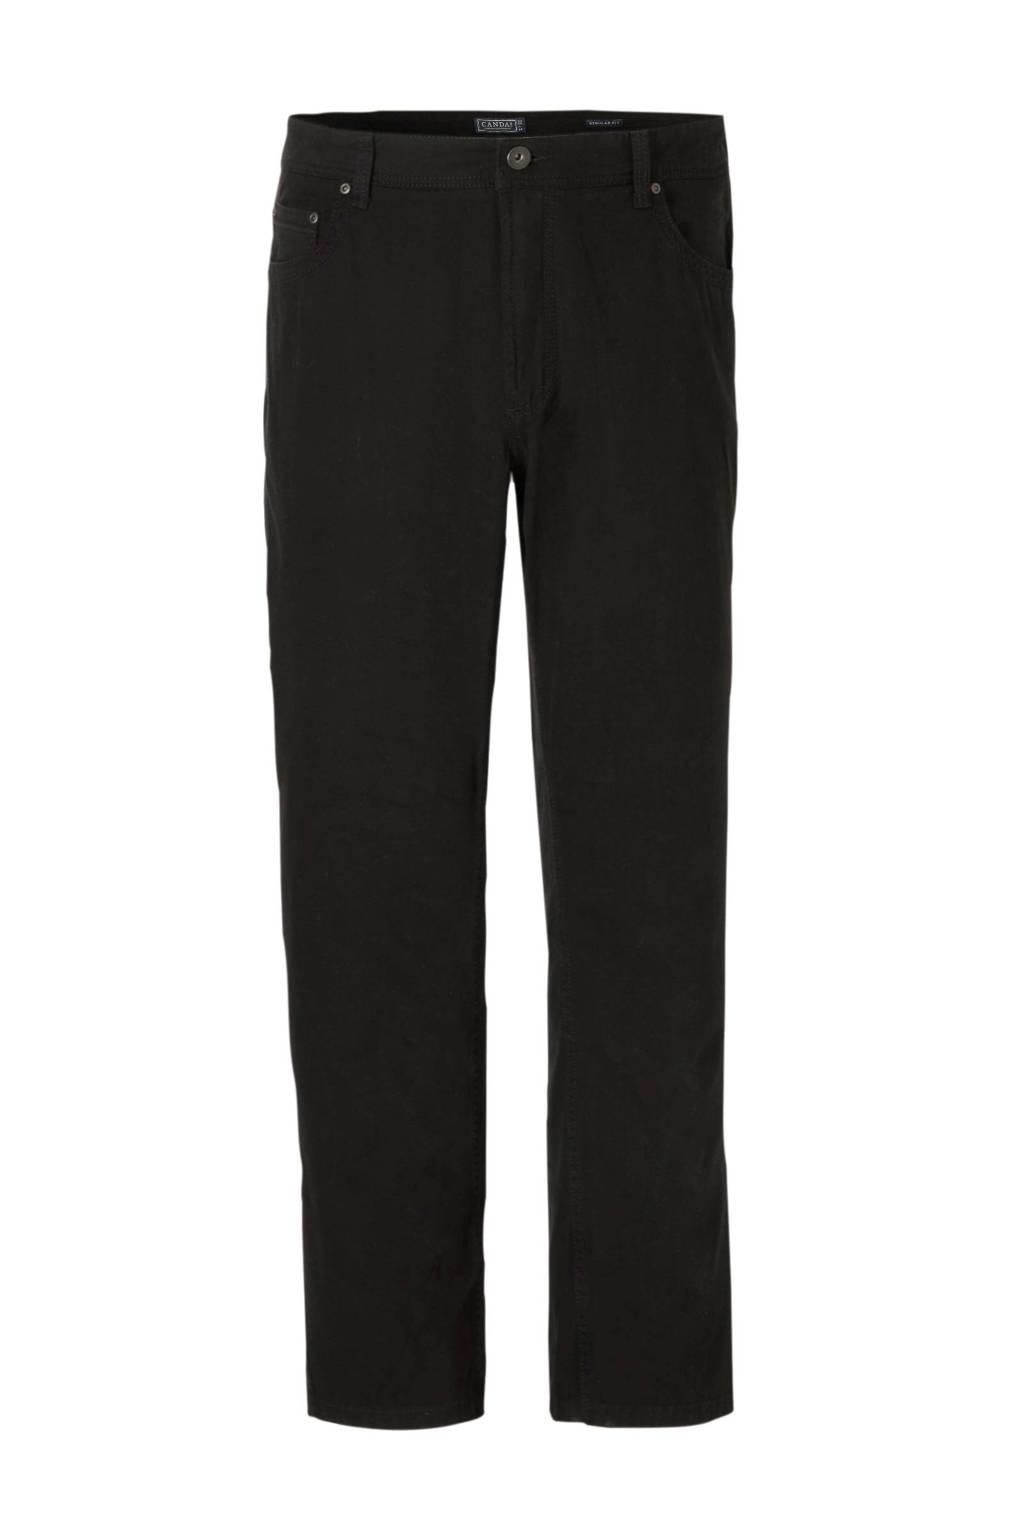 C&A XL Canda regular fit broek black36, Black36